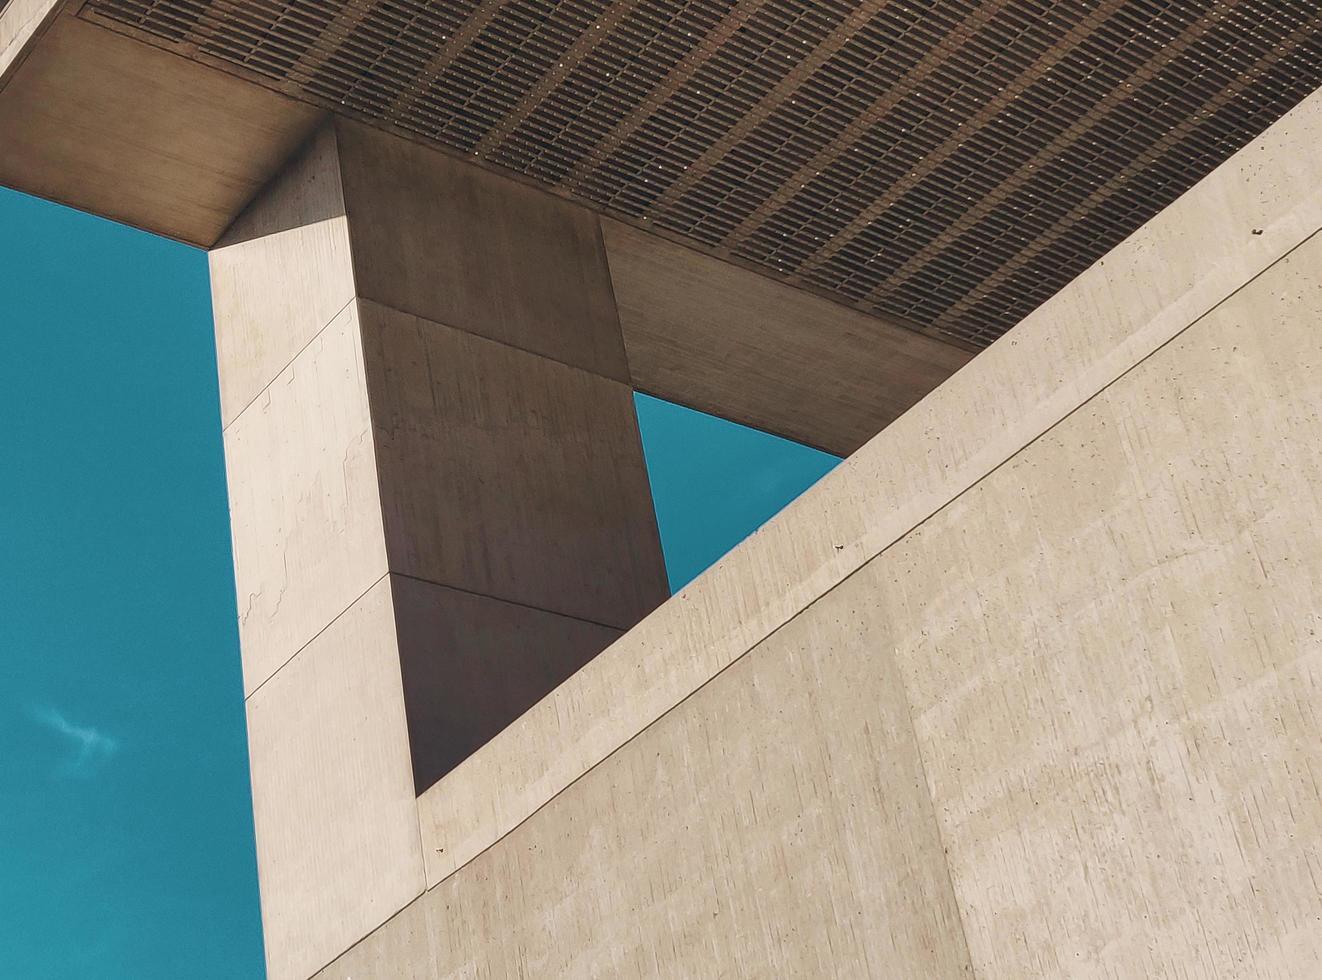 Architectural design of building photo